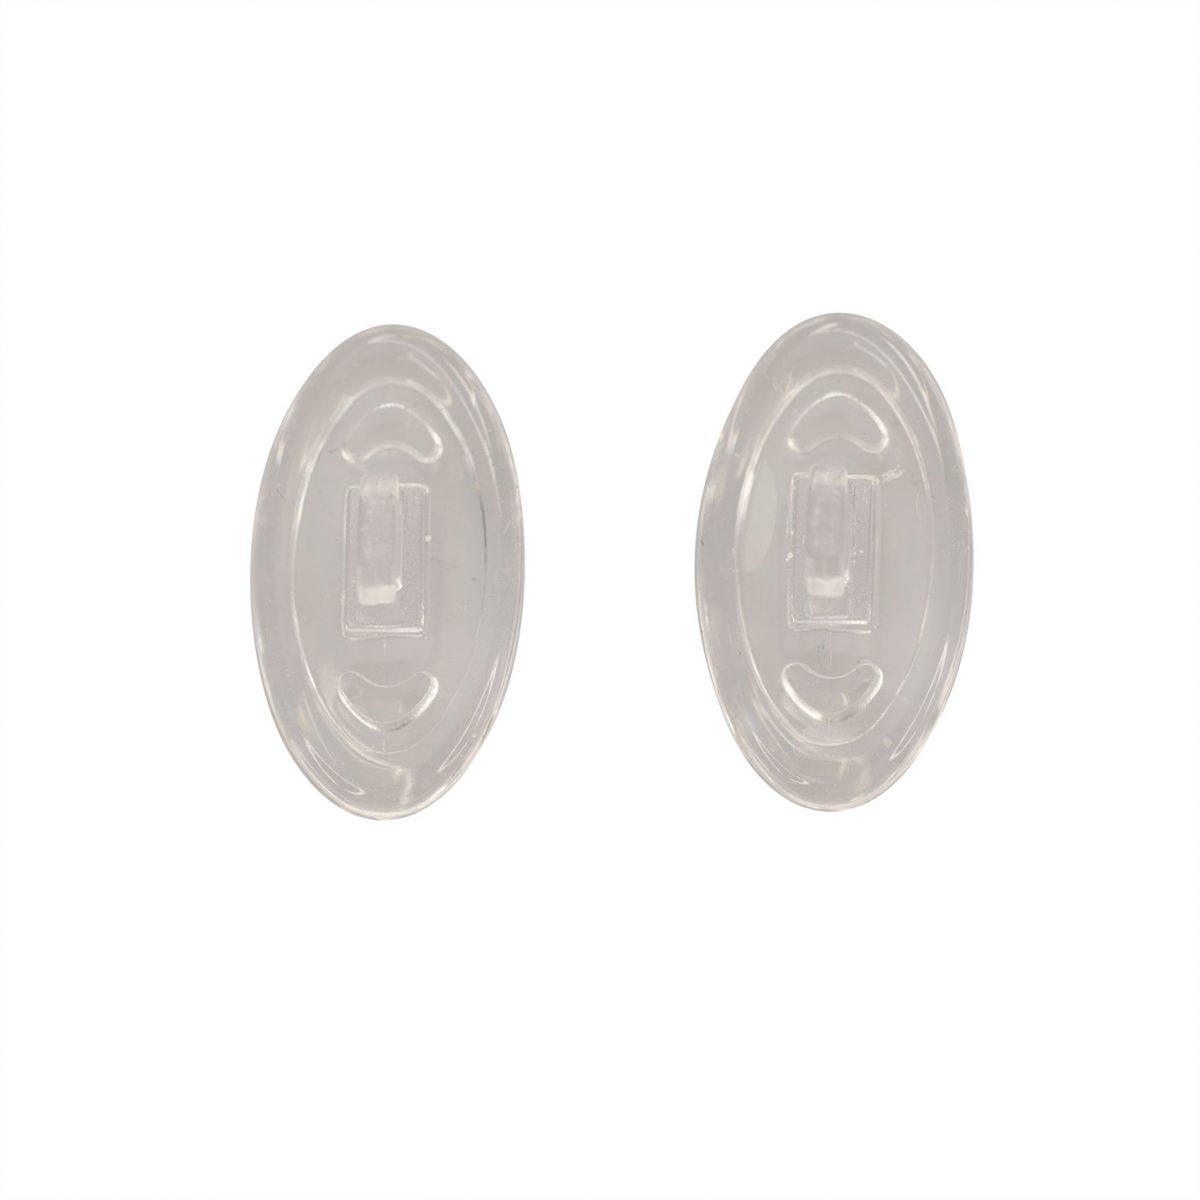 Primadonna-Silicone-Nose-Pads-13mm